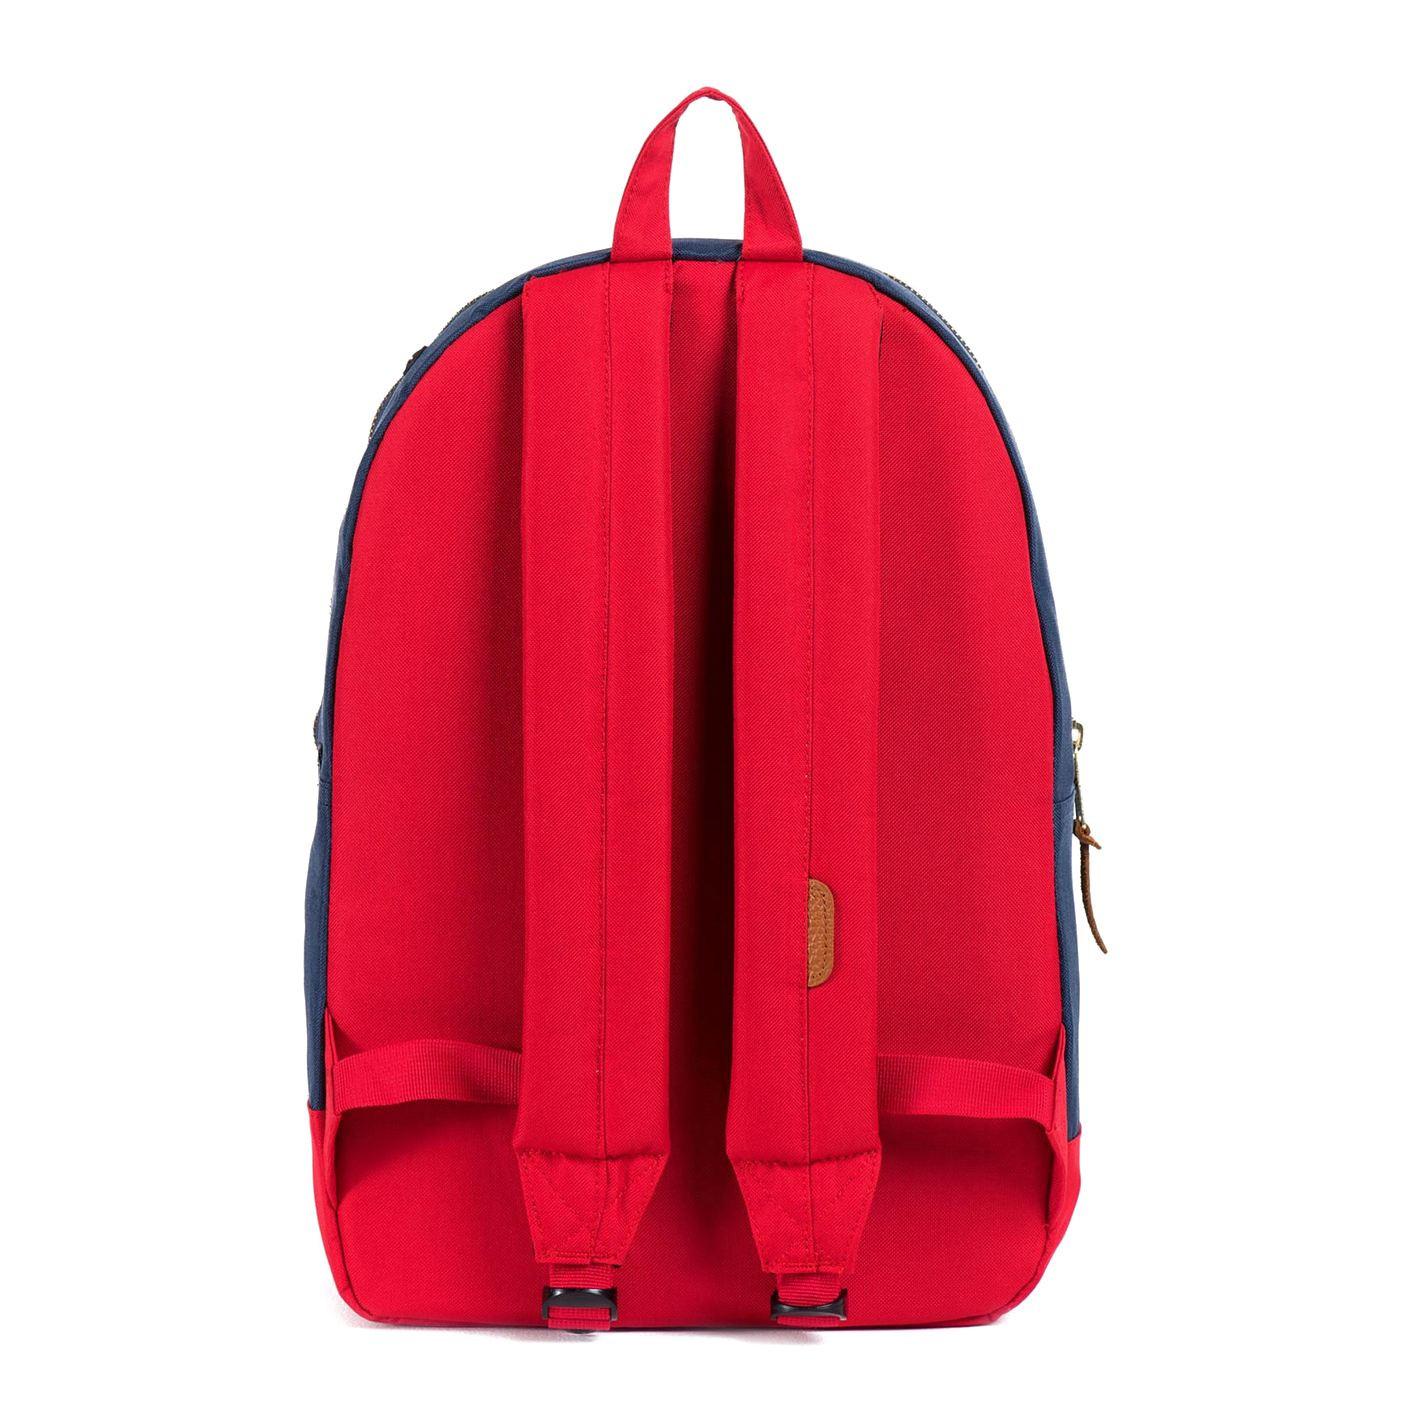 Herschel Settlement Backpack | Large